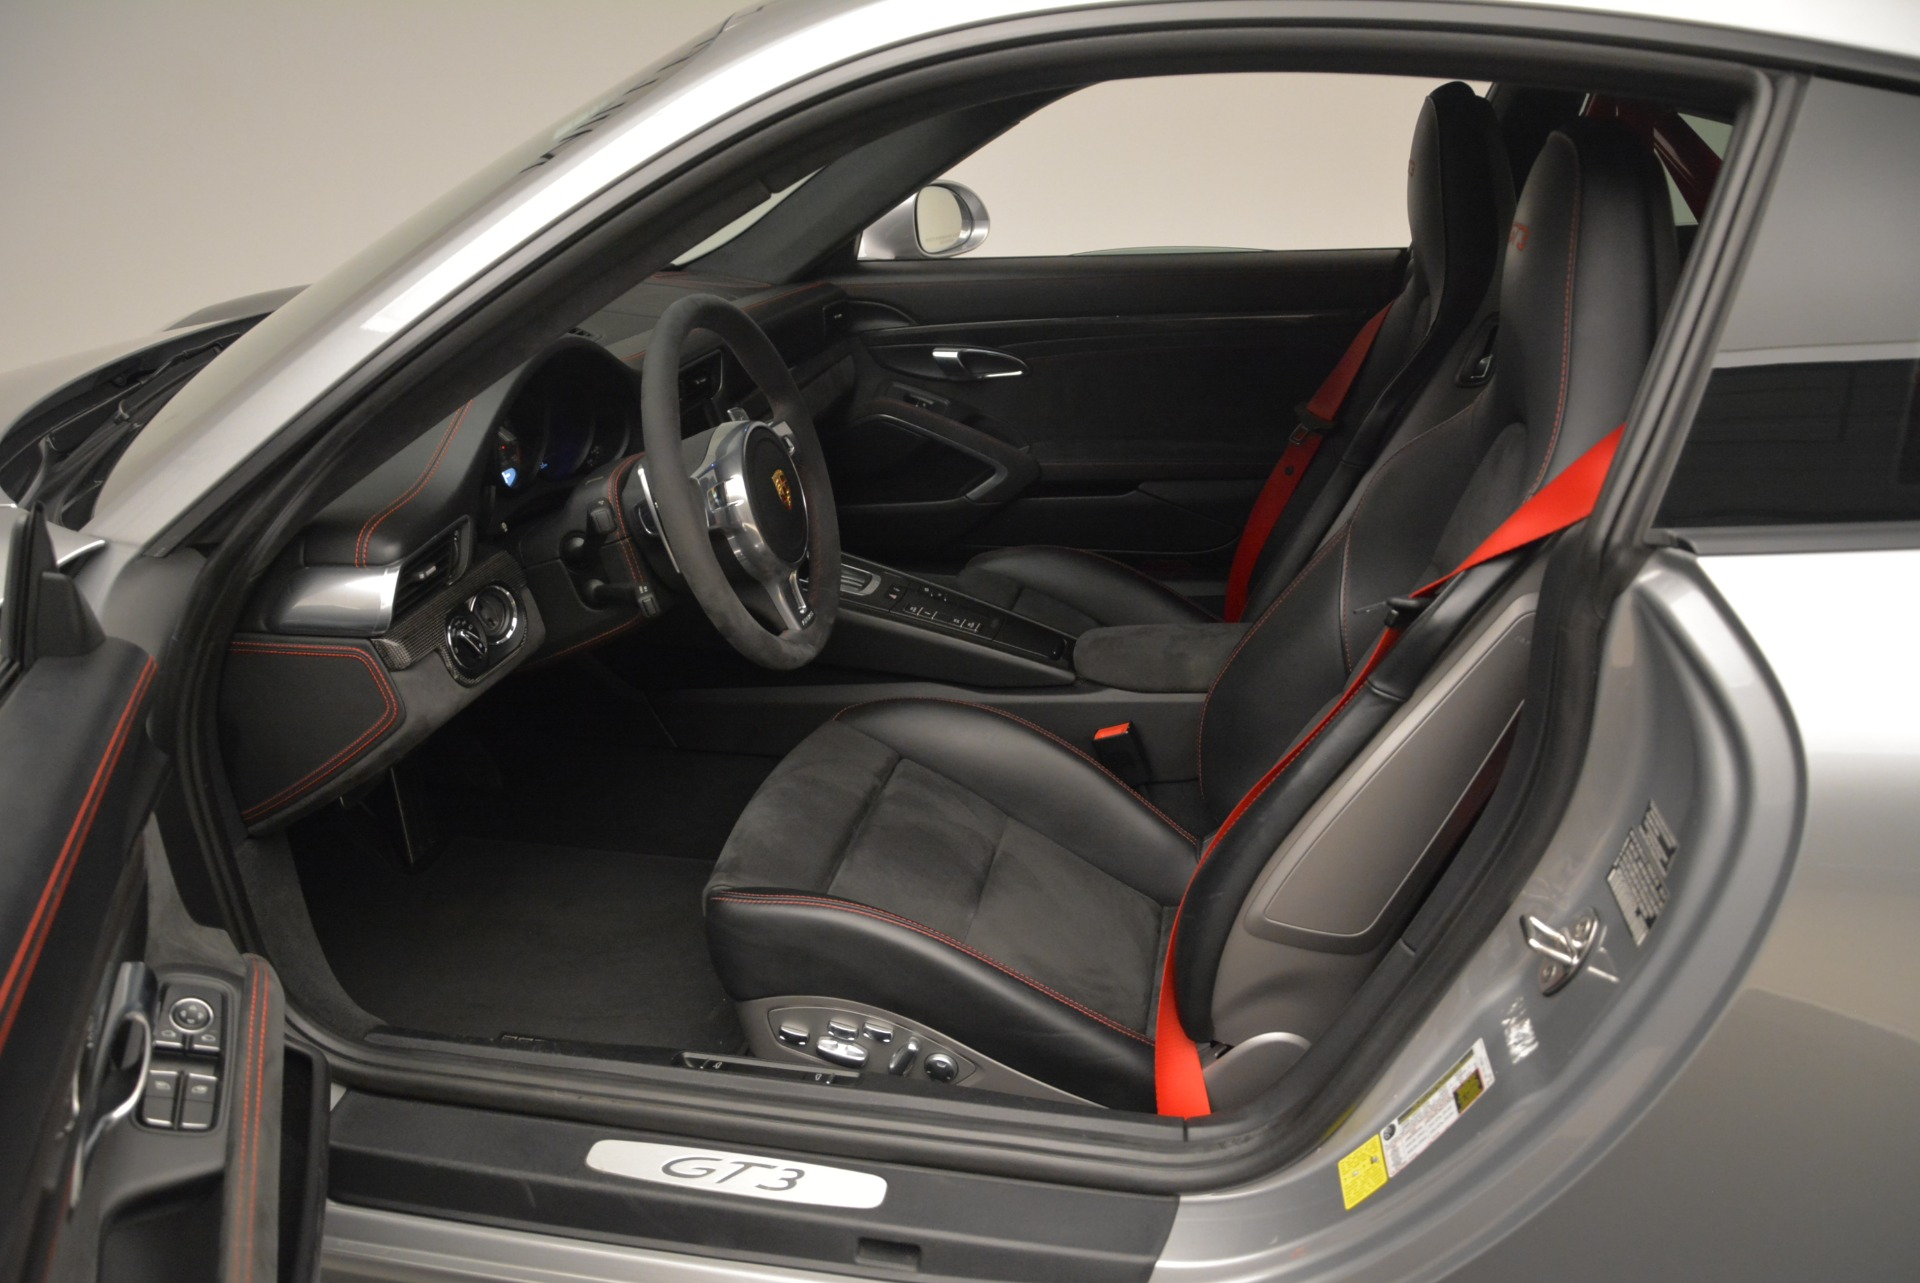 Used 2015 Porsche 911 GT3 For Sale In Greenwich, CT. Alfa Romeo of Greenwich, 4426A 2196_p19